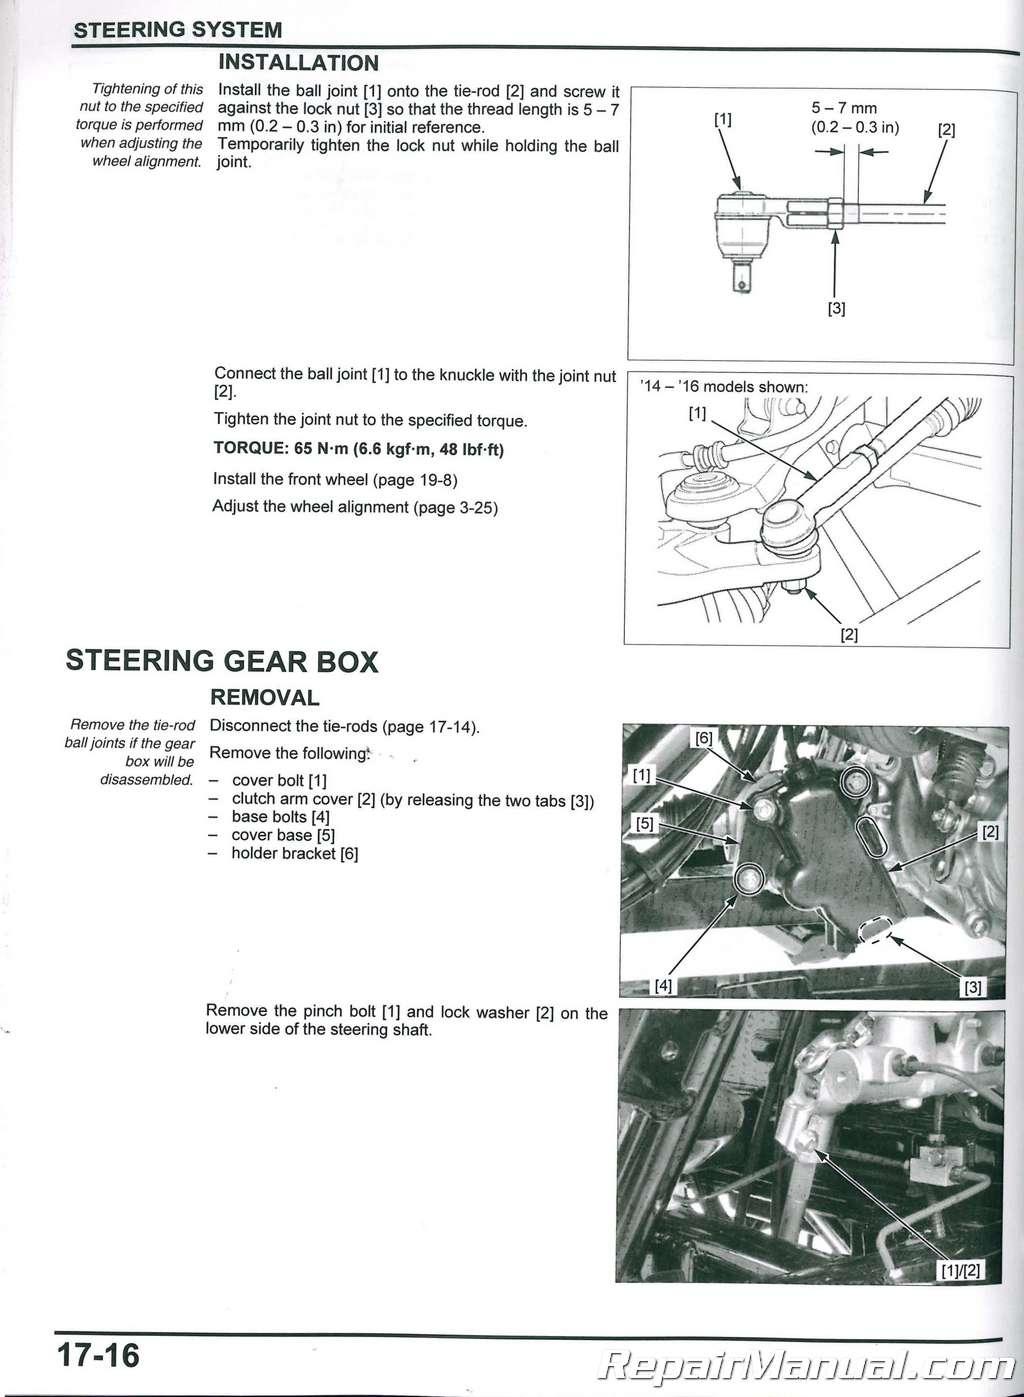 2014 2018 Honda Sxs700 M2 M4 Pioneer Utv Service Manual 700r Torque Converter Wiring Diagram